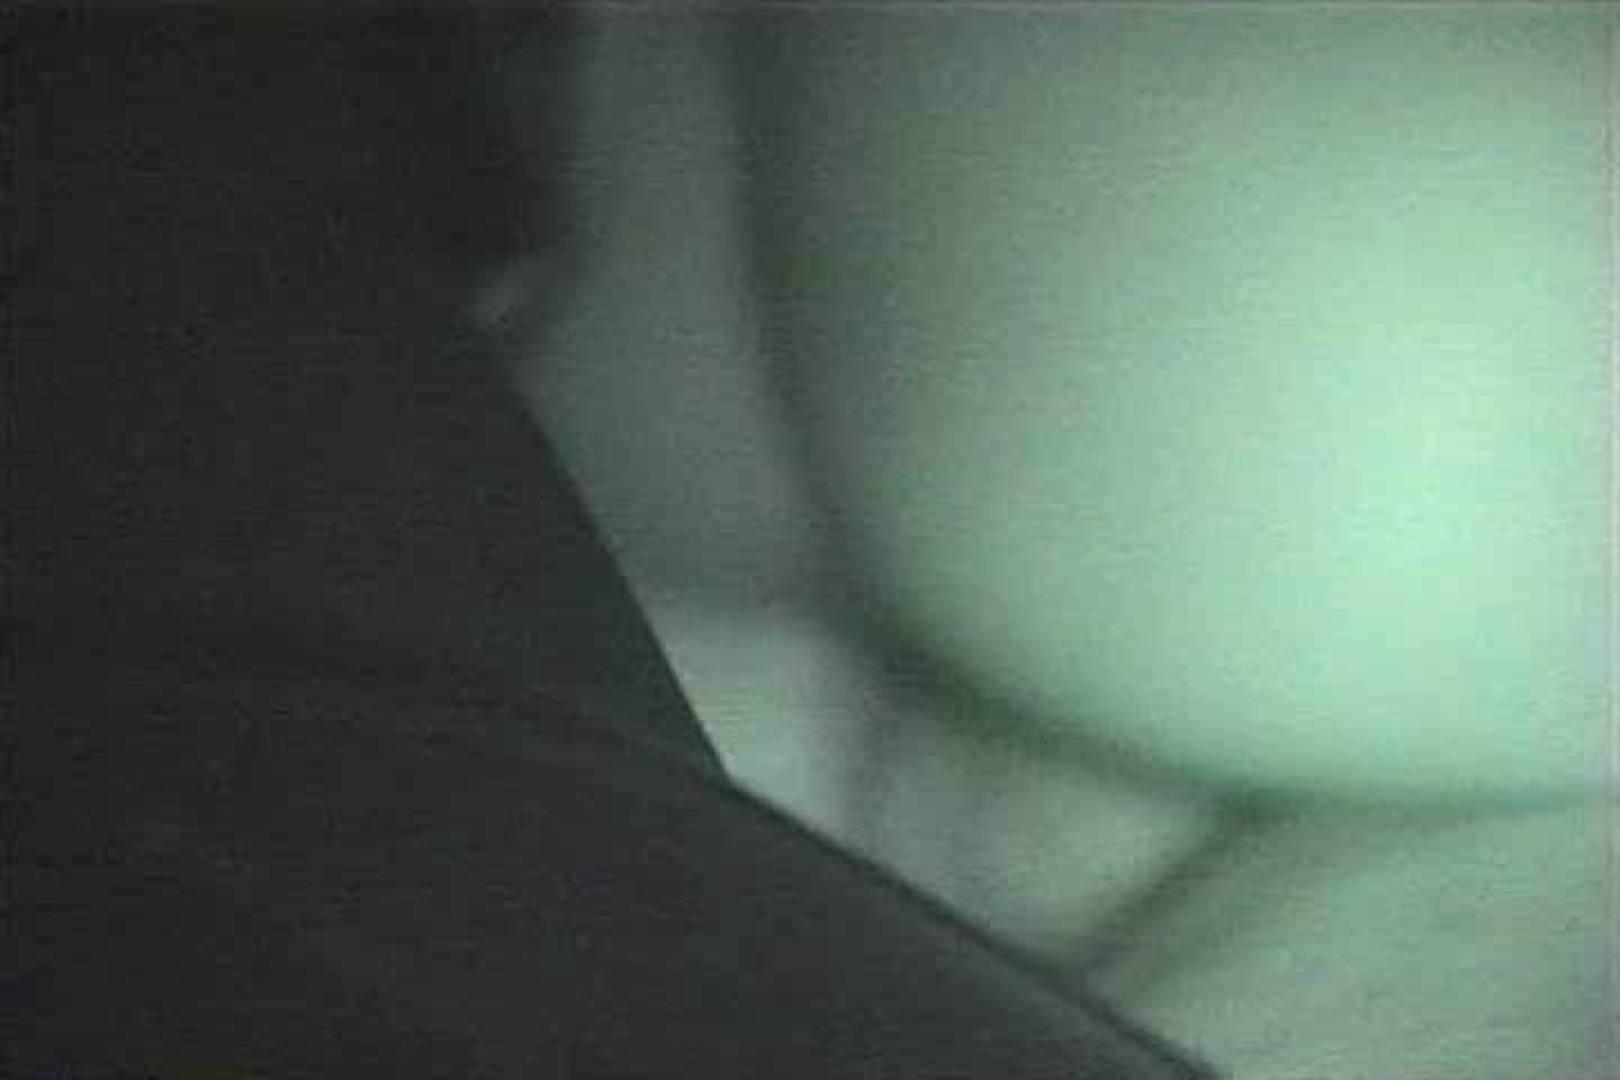 MASAさんの待ち伏せ撮り! 赤外線カーセックスVol.19 OLの実態 | 赤外線  69pic 31